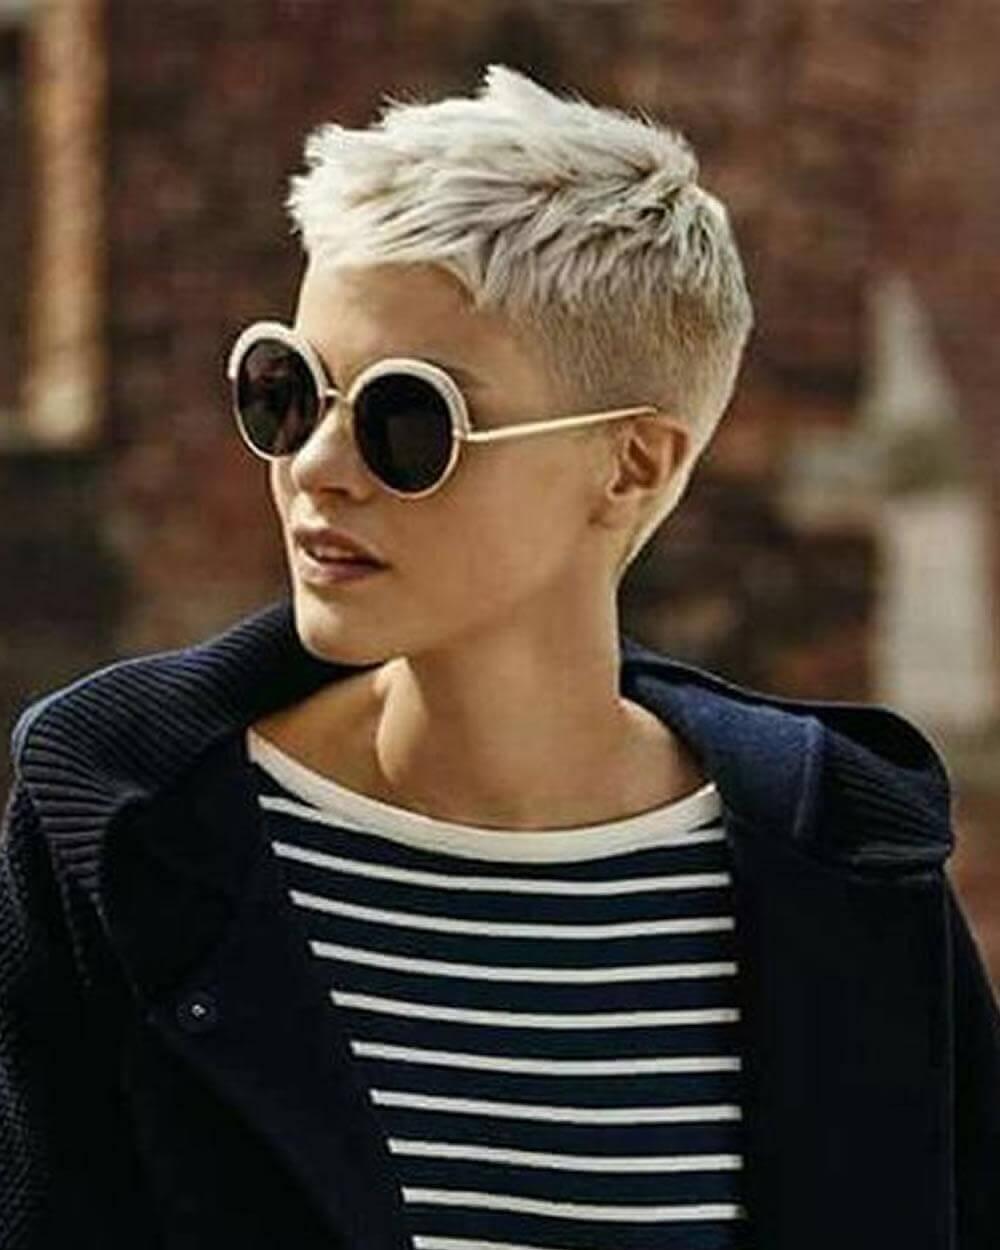 Super Short Haircuts 2021 - 14+ | Trendiem | Hairstyles ...